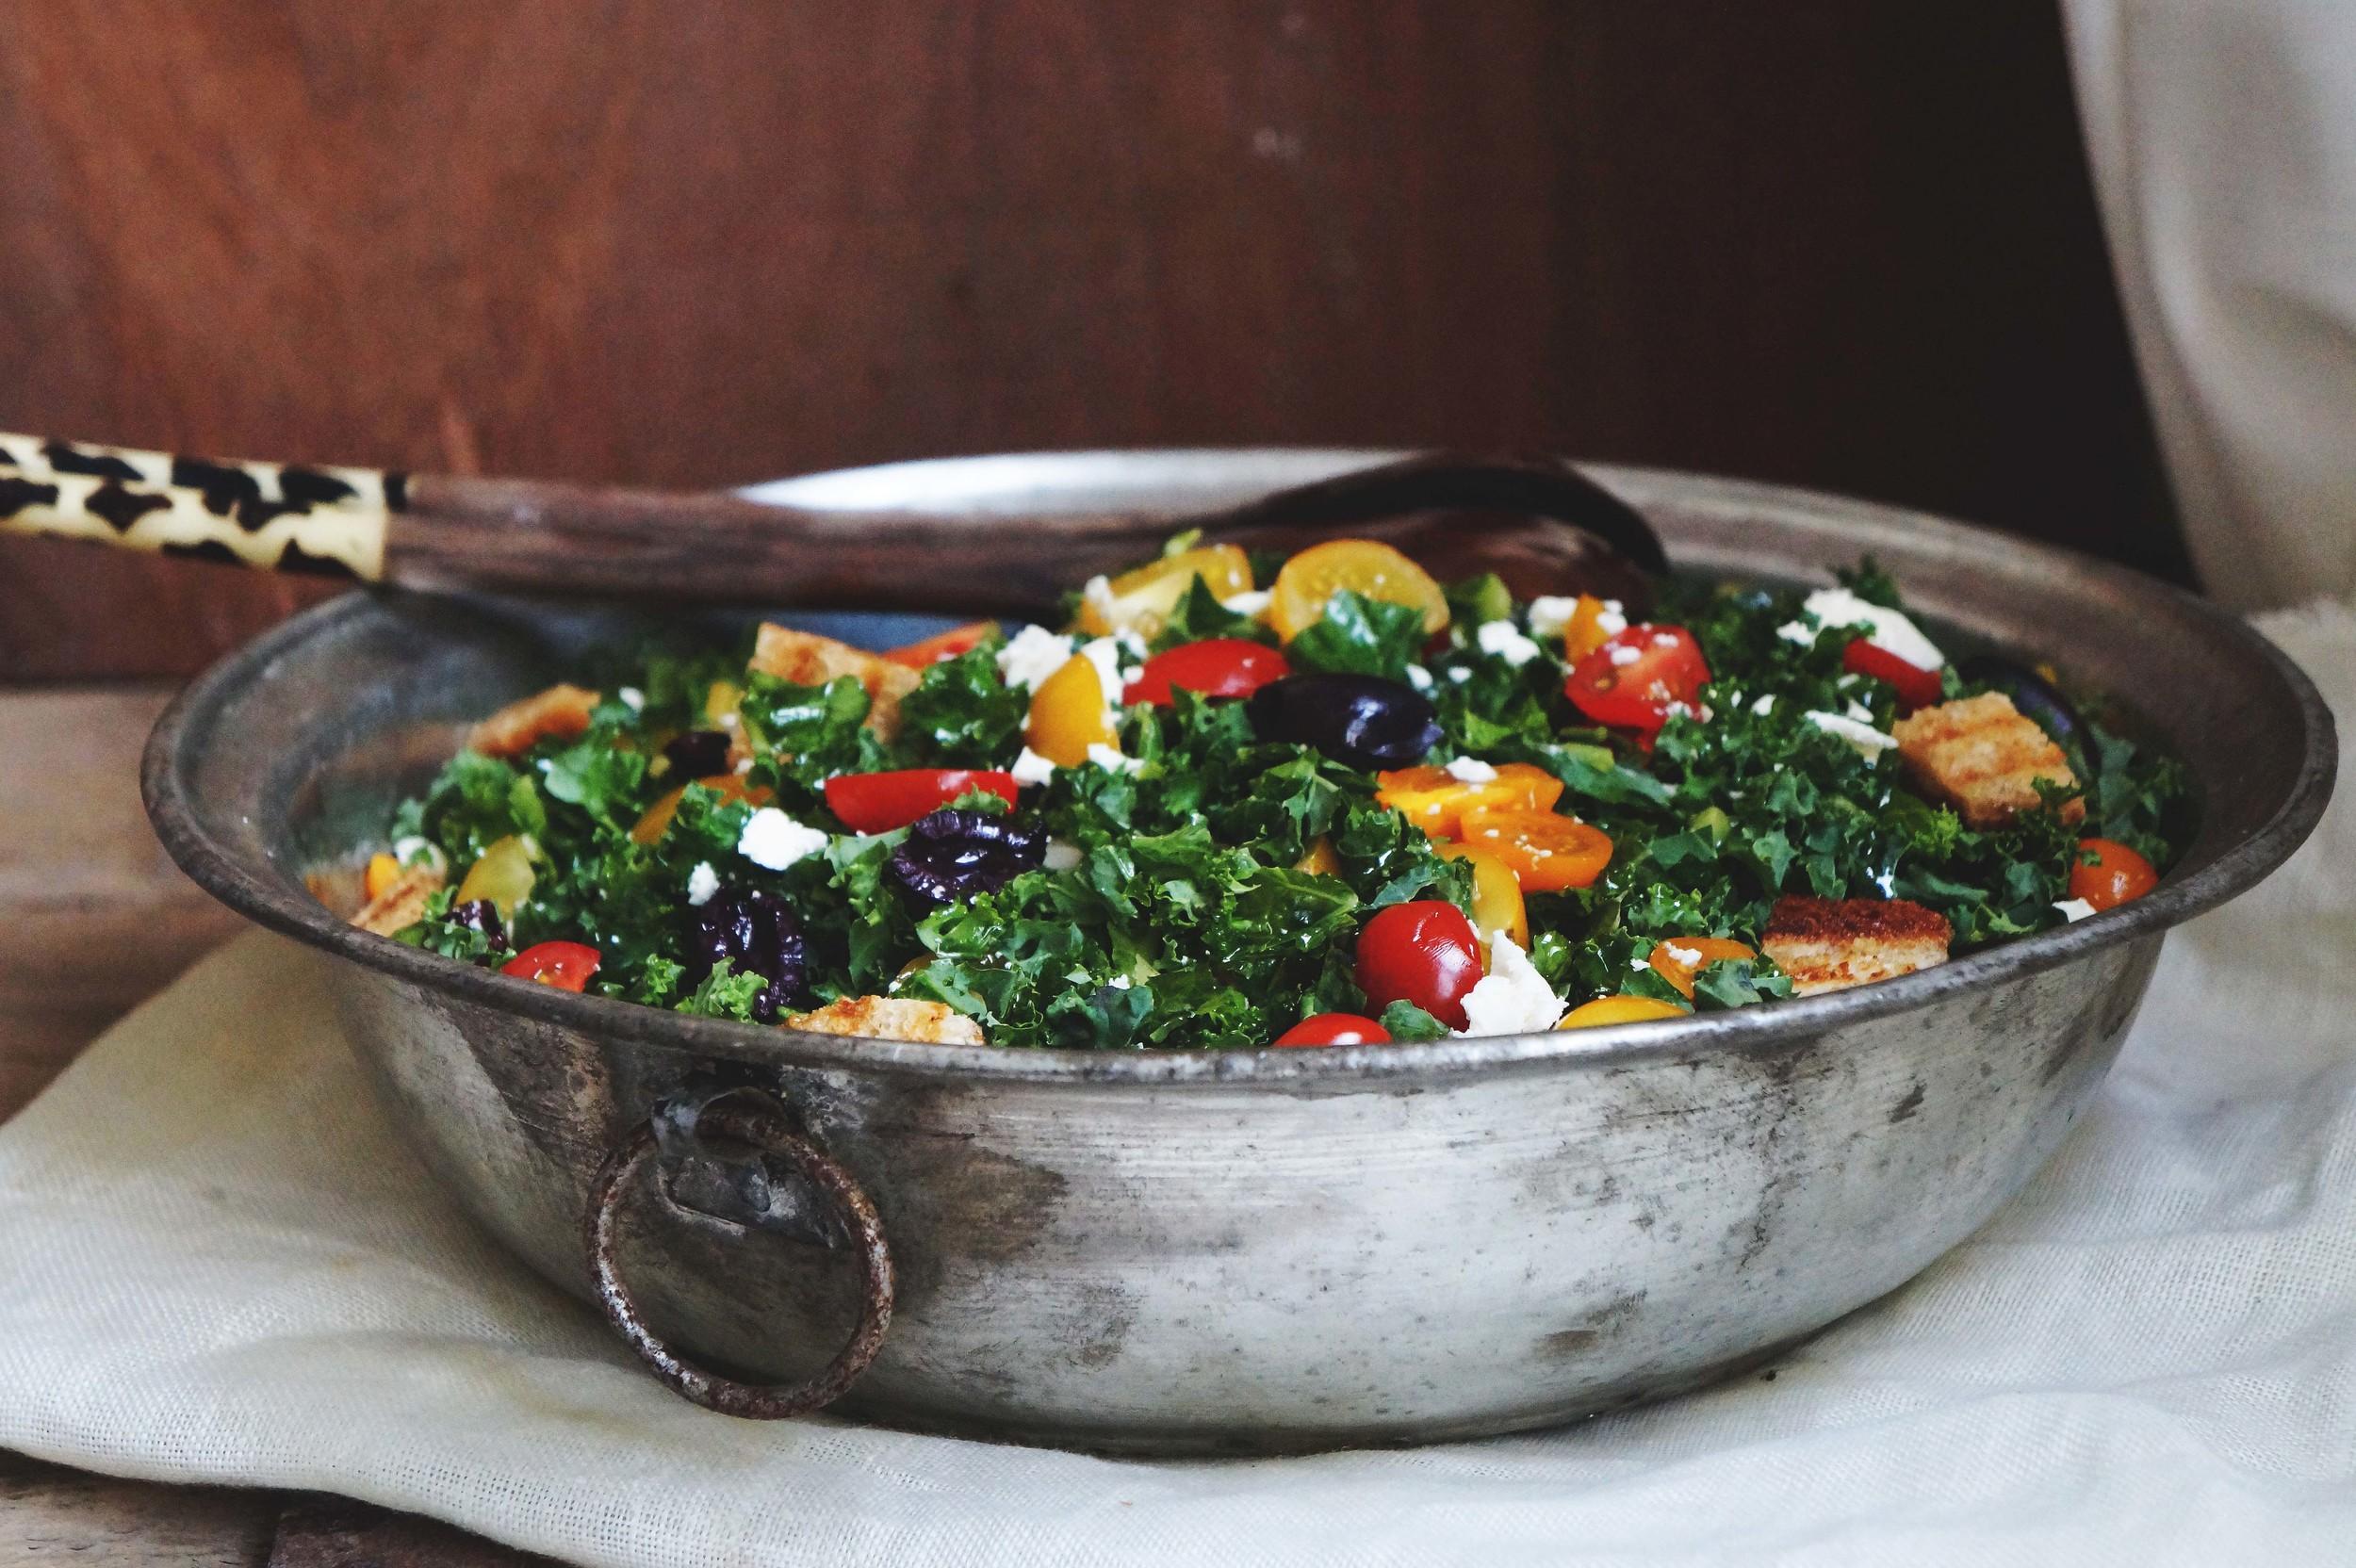 Cuisine de Clementine - boerenkool salade met feta-knoflook dressing